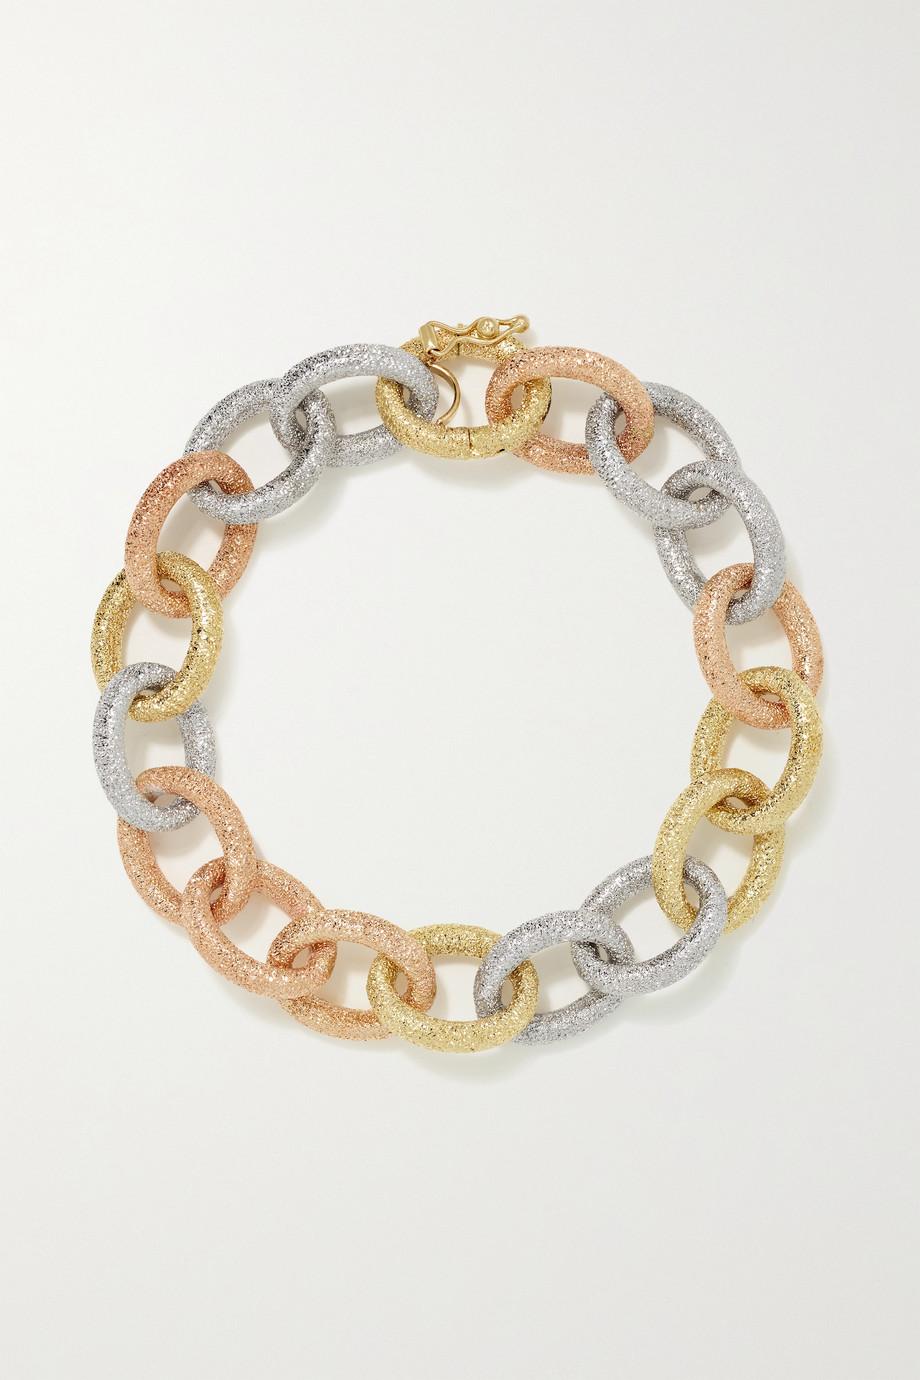 Carolina Bucci Bracelet en or jaune, rose et blanc 18 carats Florentine